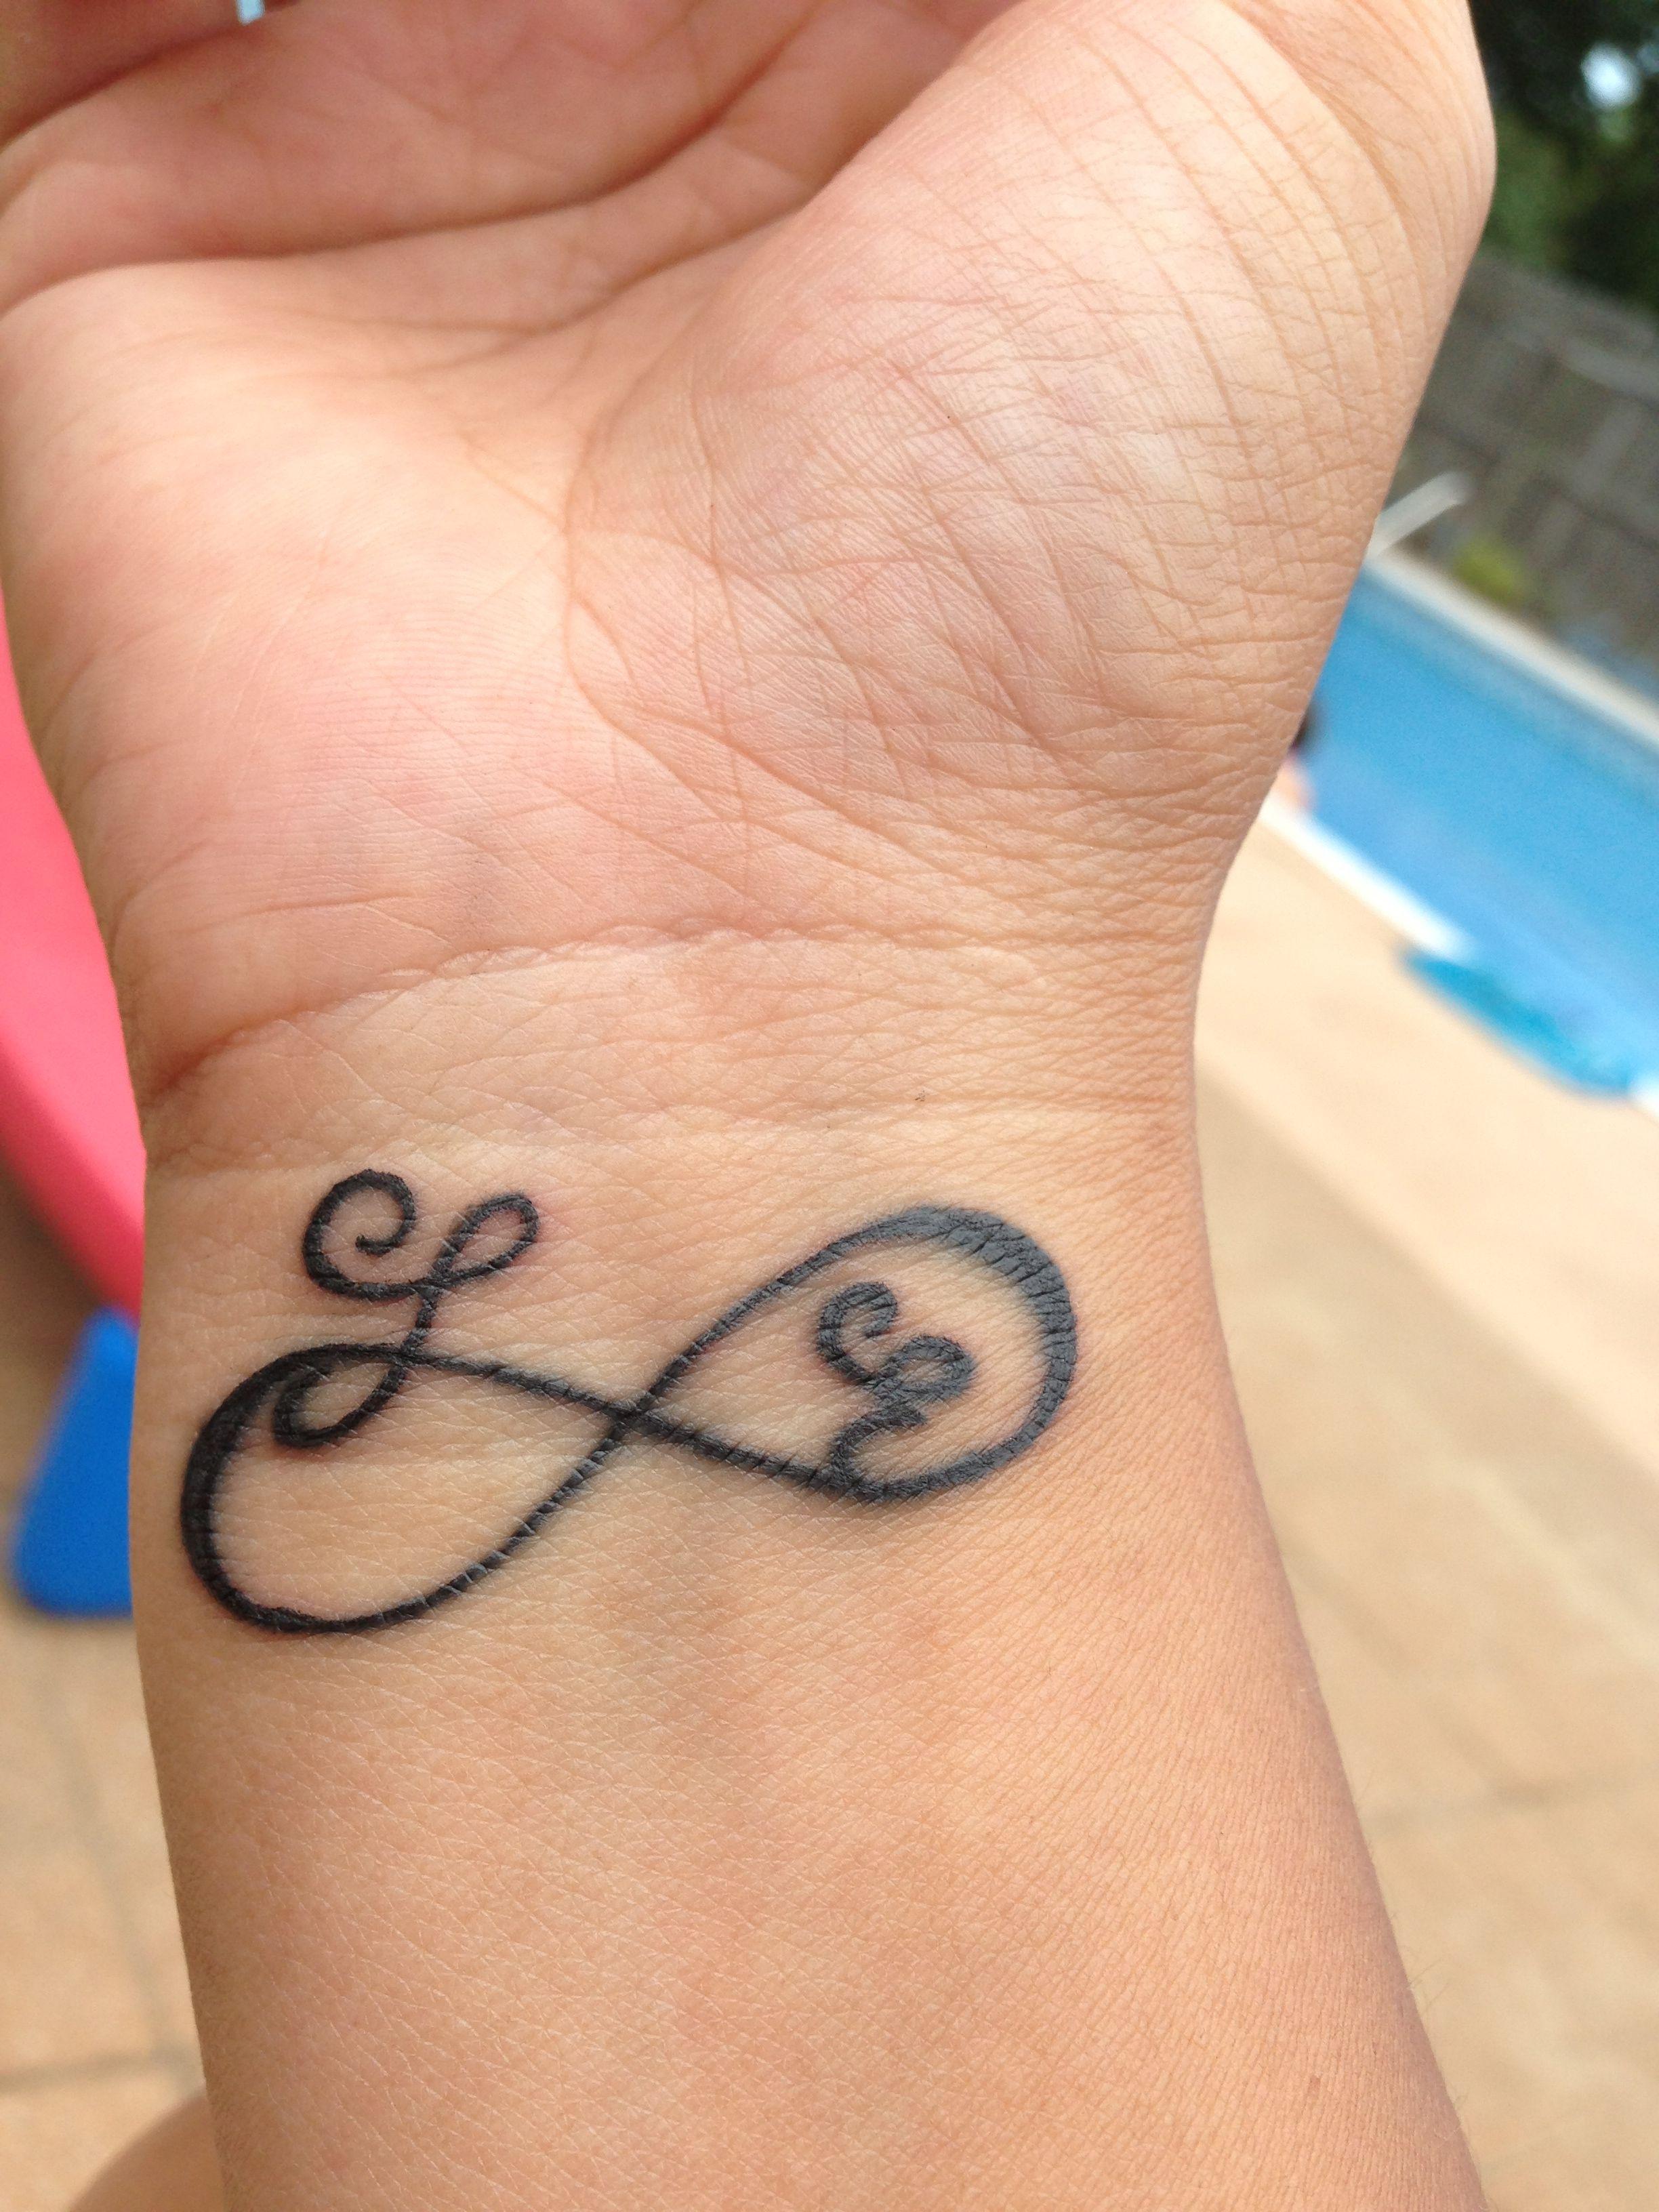 Infinity Tattoo With My Kids Initials Tattoos Tattoos Infinity